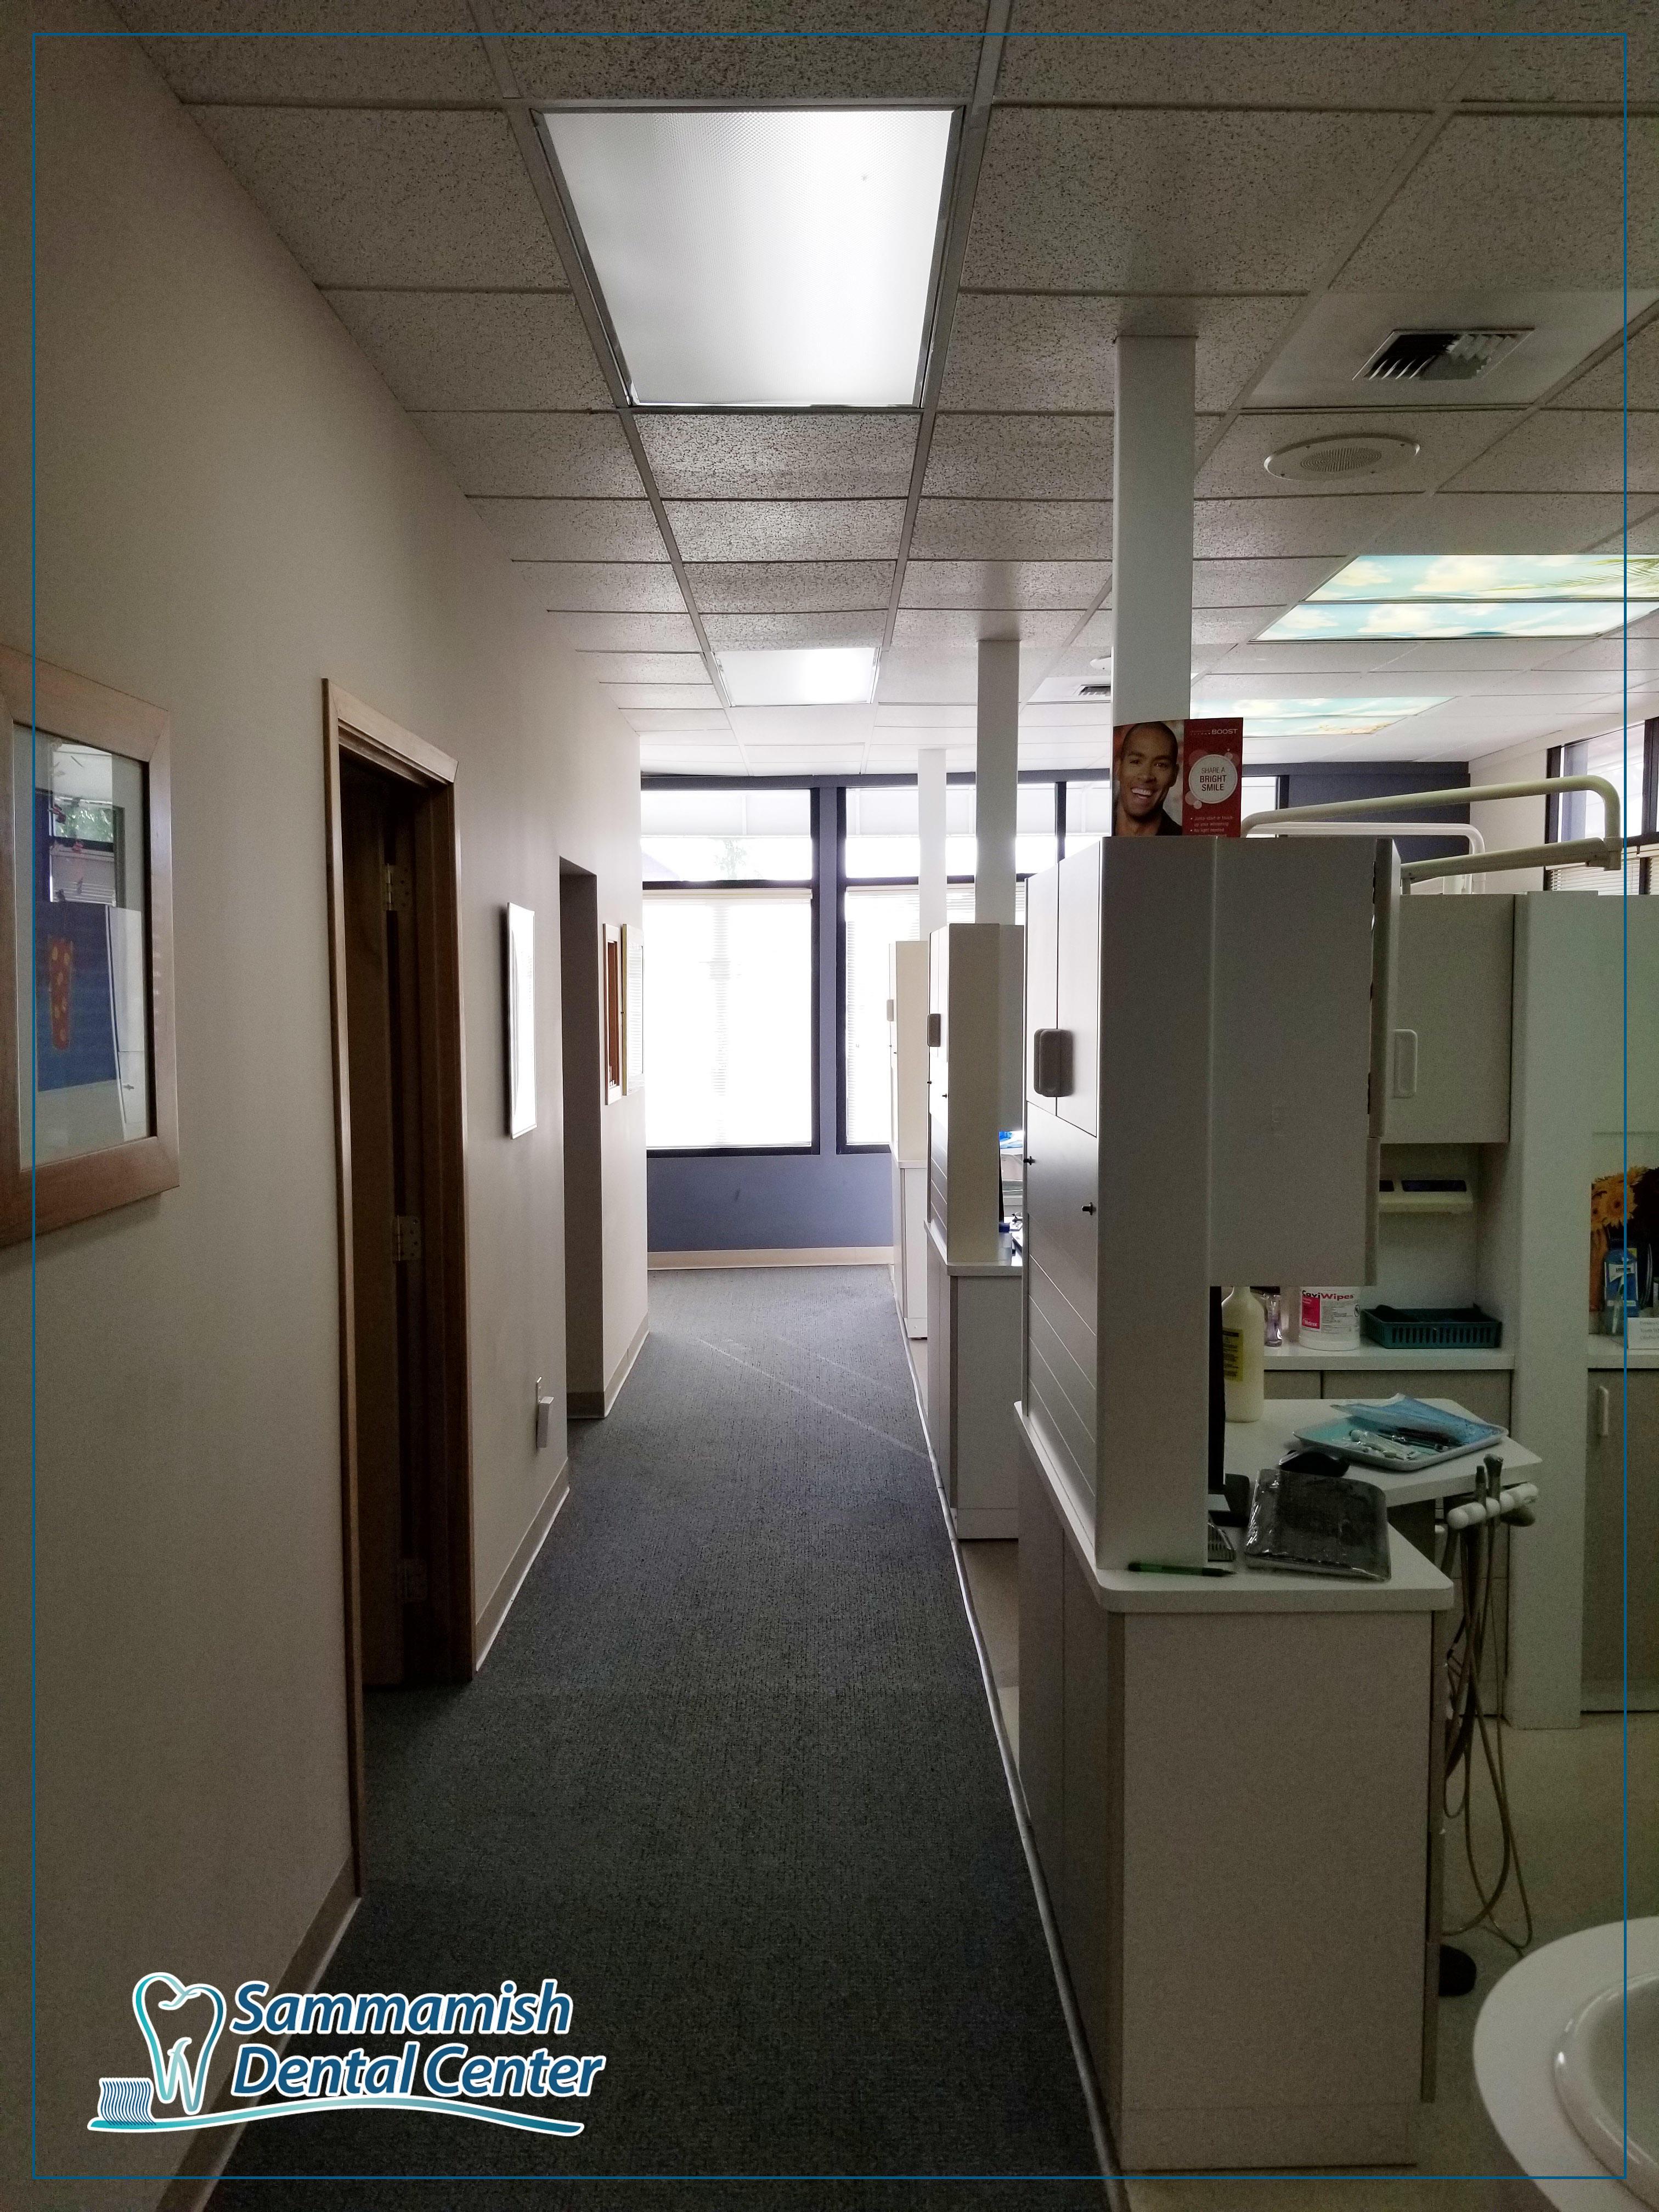 Sammamish Dental Center - Invisalign, Family, Cosmetic, Implants Dentistry, 700 Northwest Gilman Boulevard E101 Issaquah, WA 98027